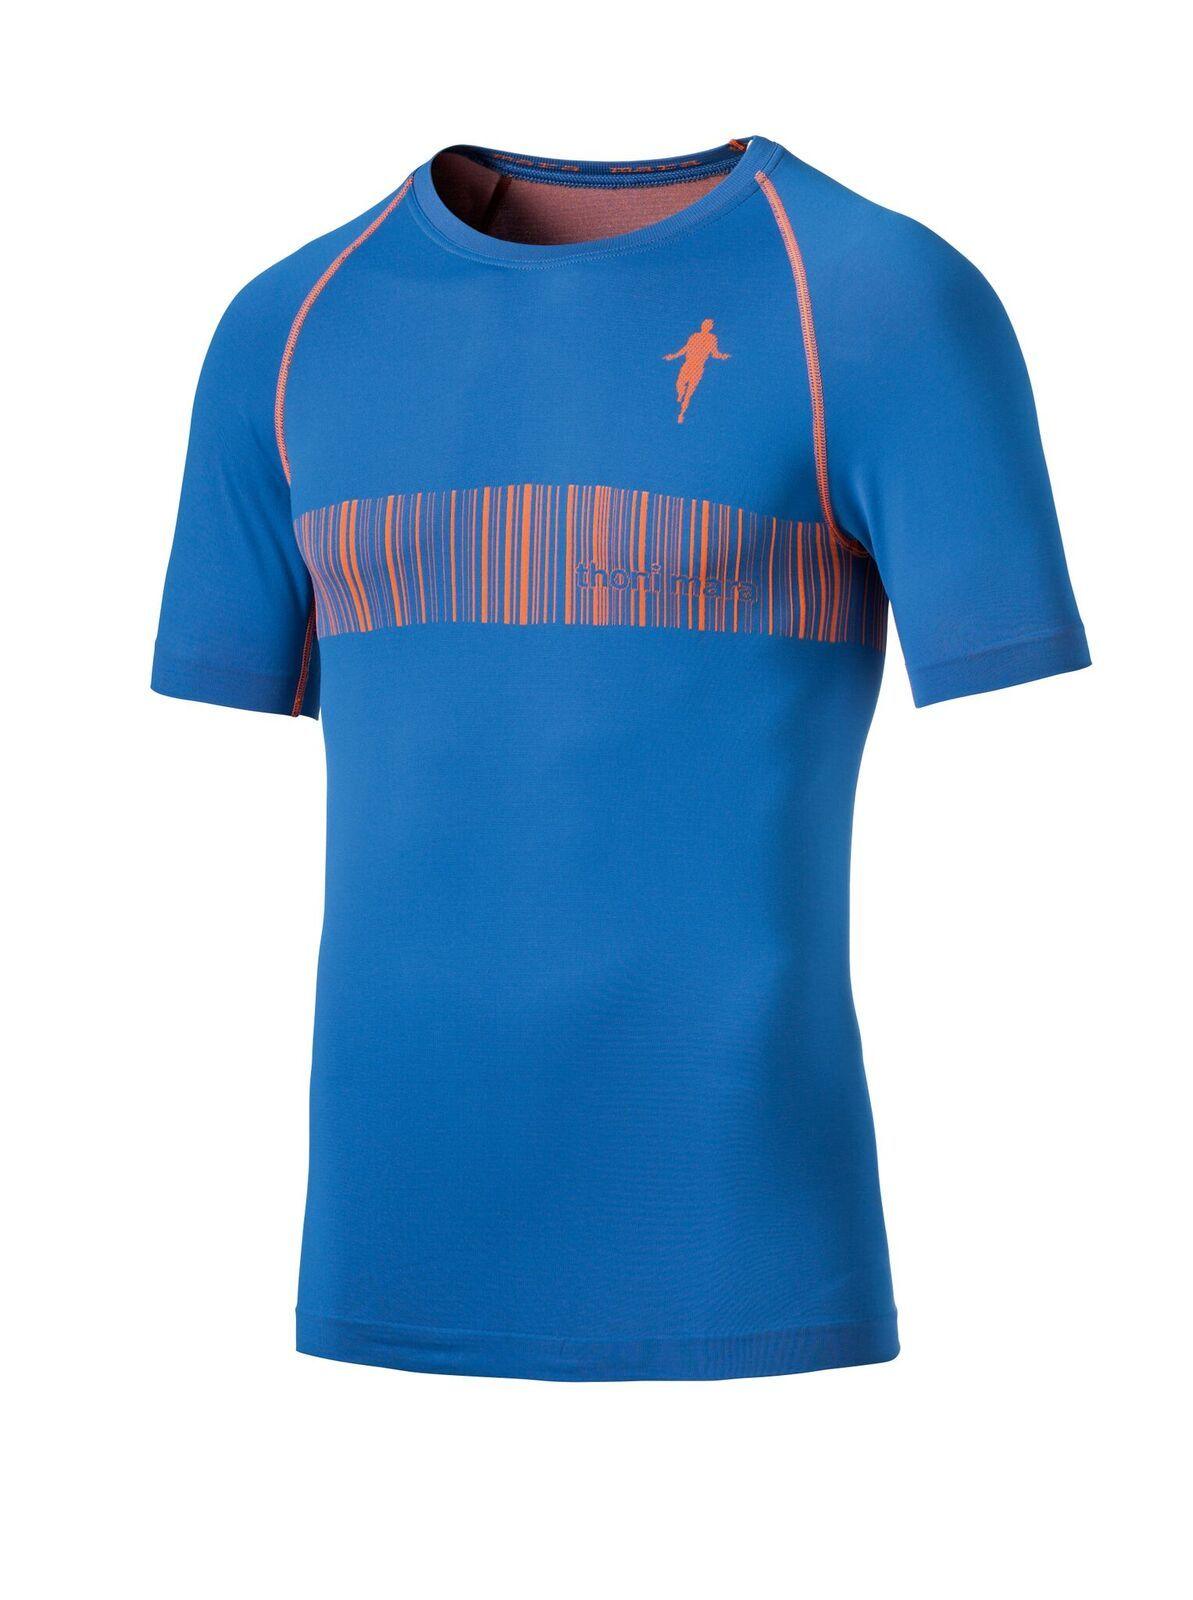 Thonimara Ti Shirt EAN (Grau Orange)